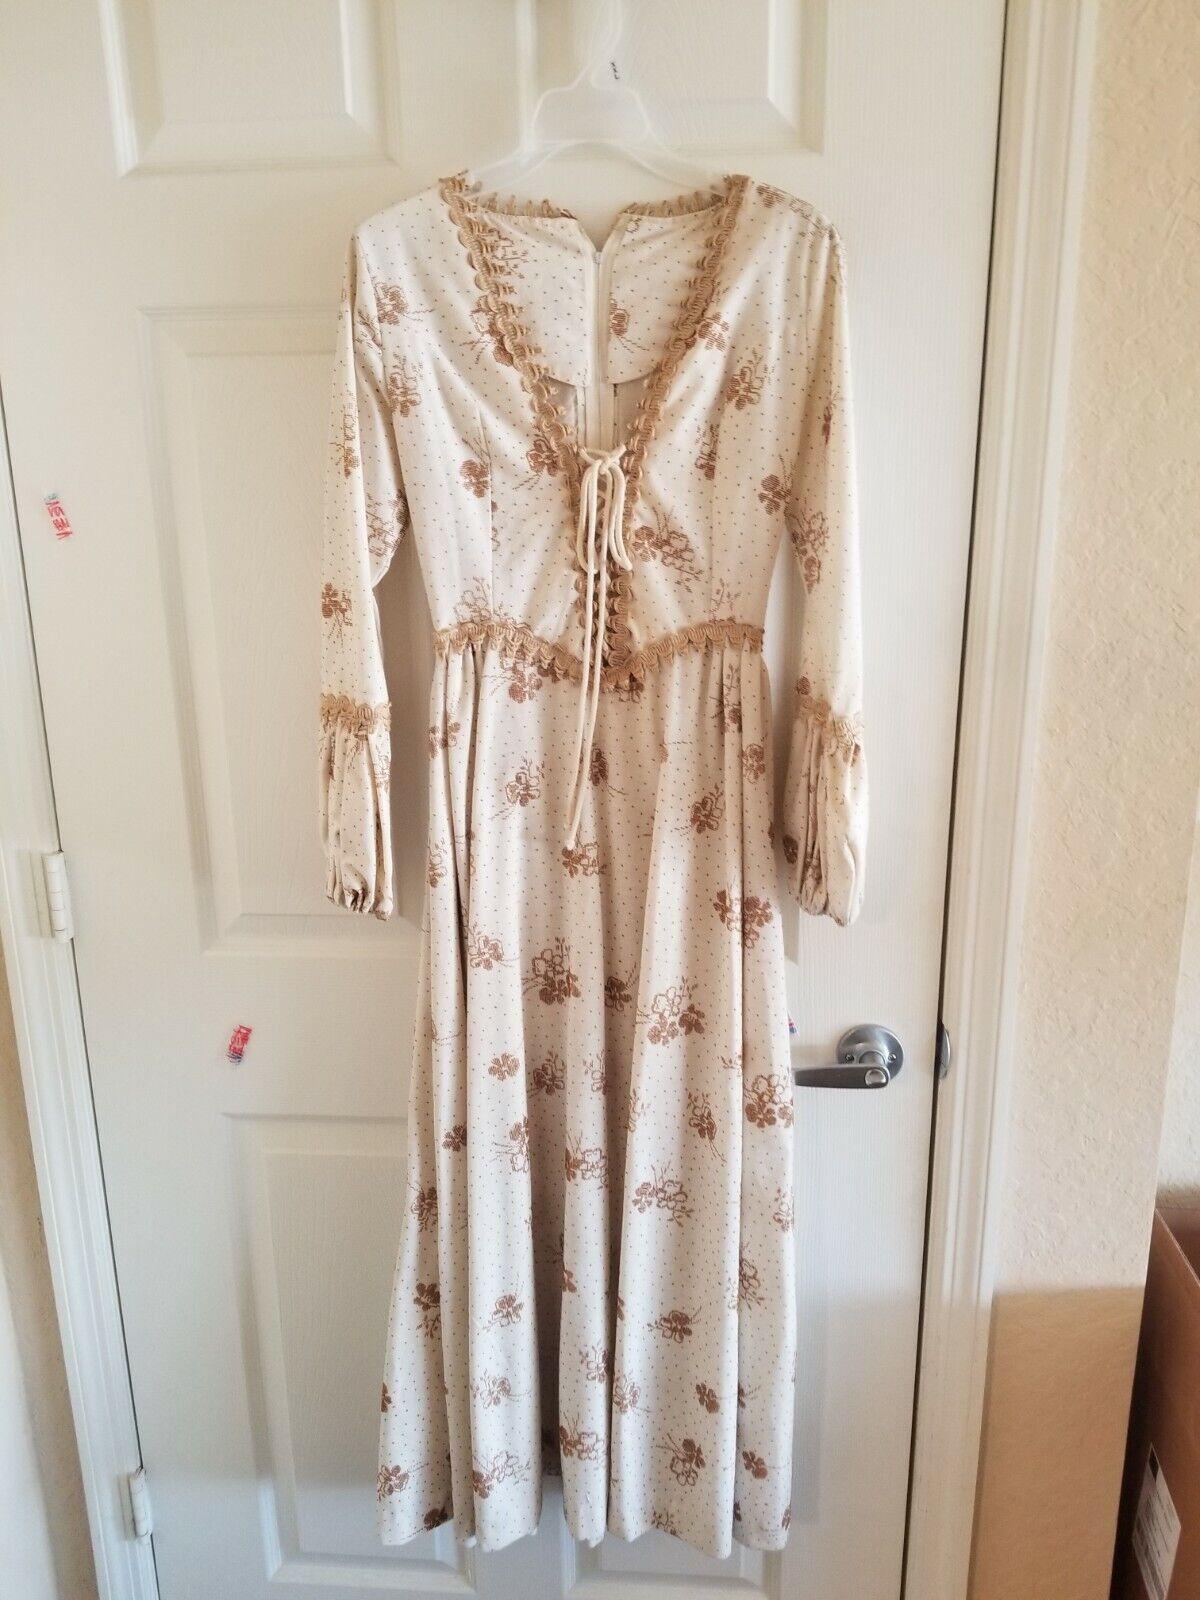 Gunne Sax Renaissance Dress - image 1